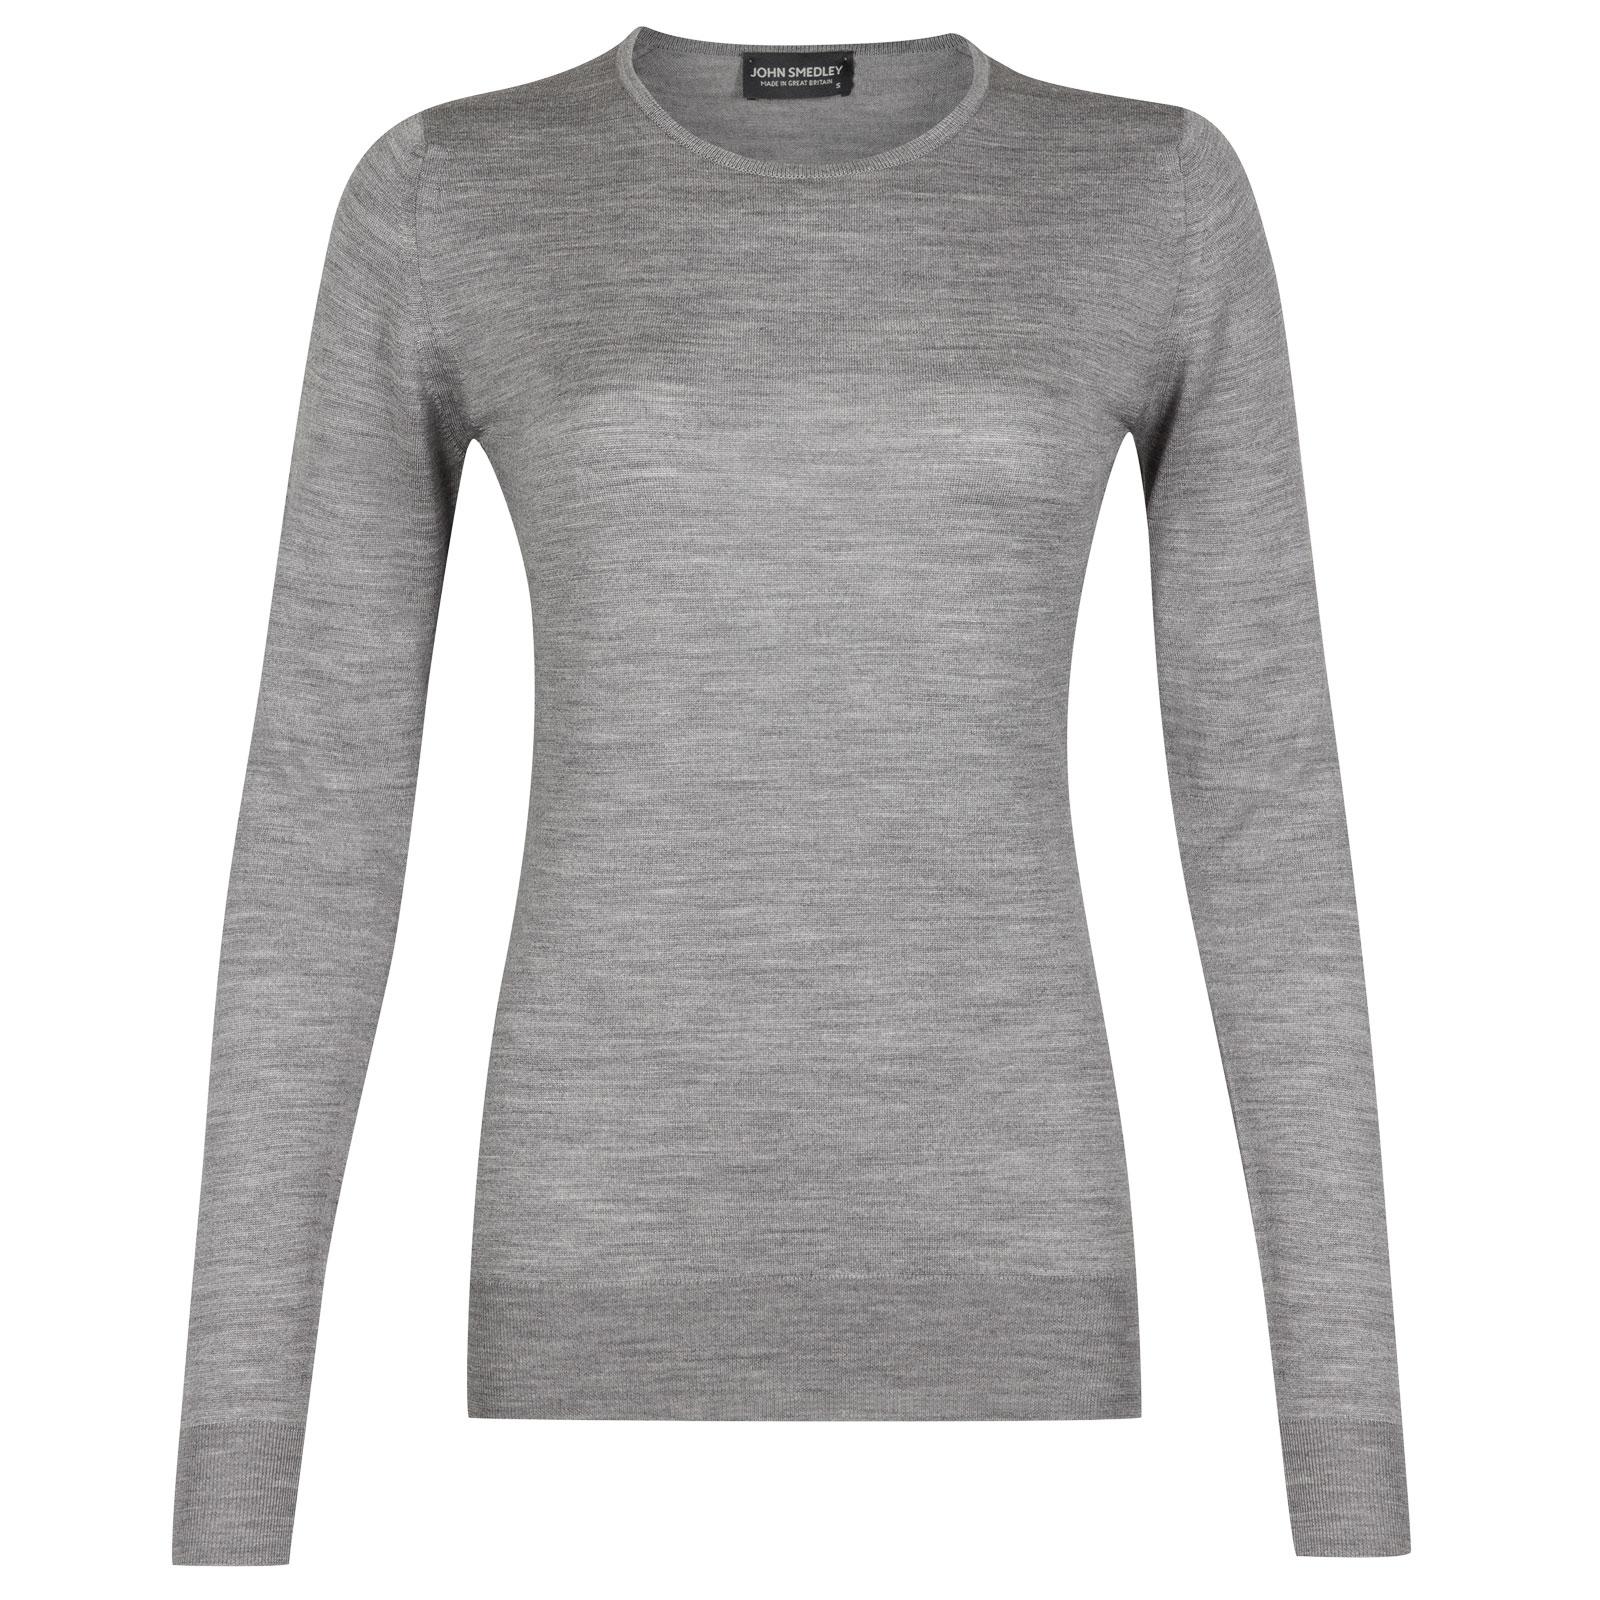 John Smedley geranium Merino Wool Sweater in Silver-XL